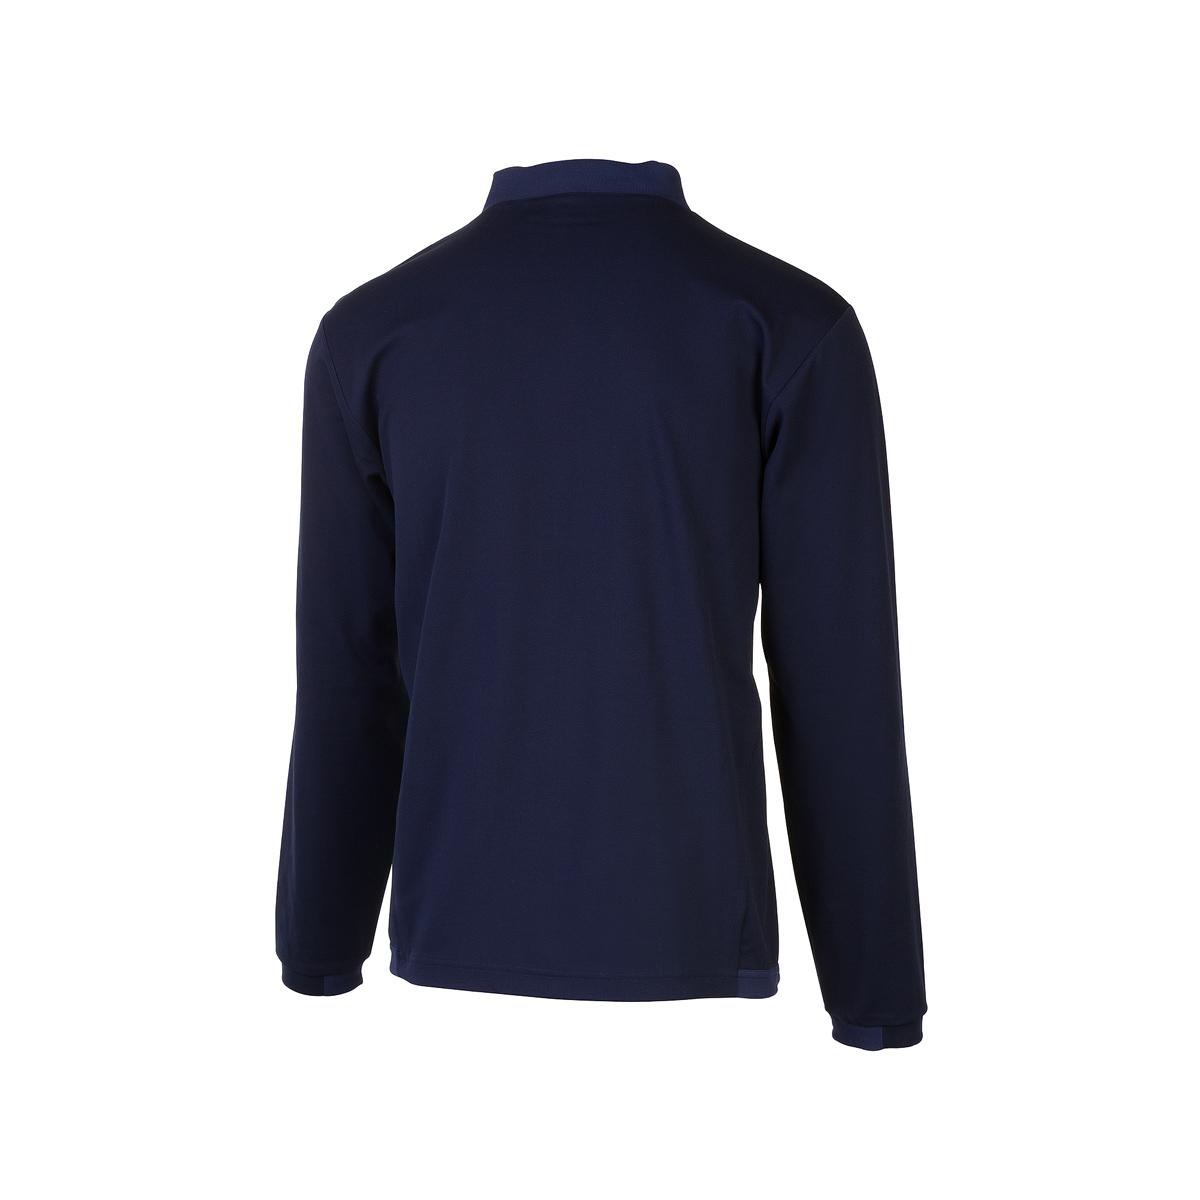 YONEX - Men's Warm-up Jacket #50111Detailbild - 1